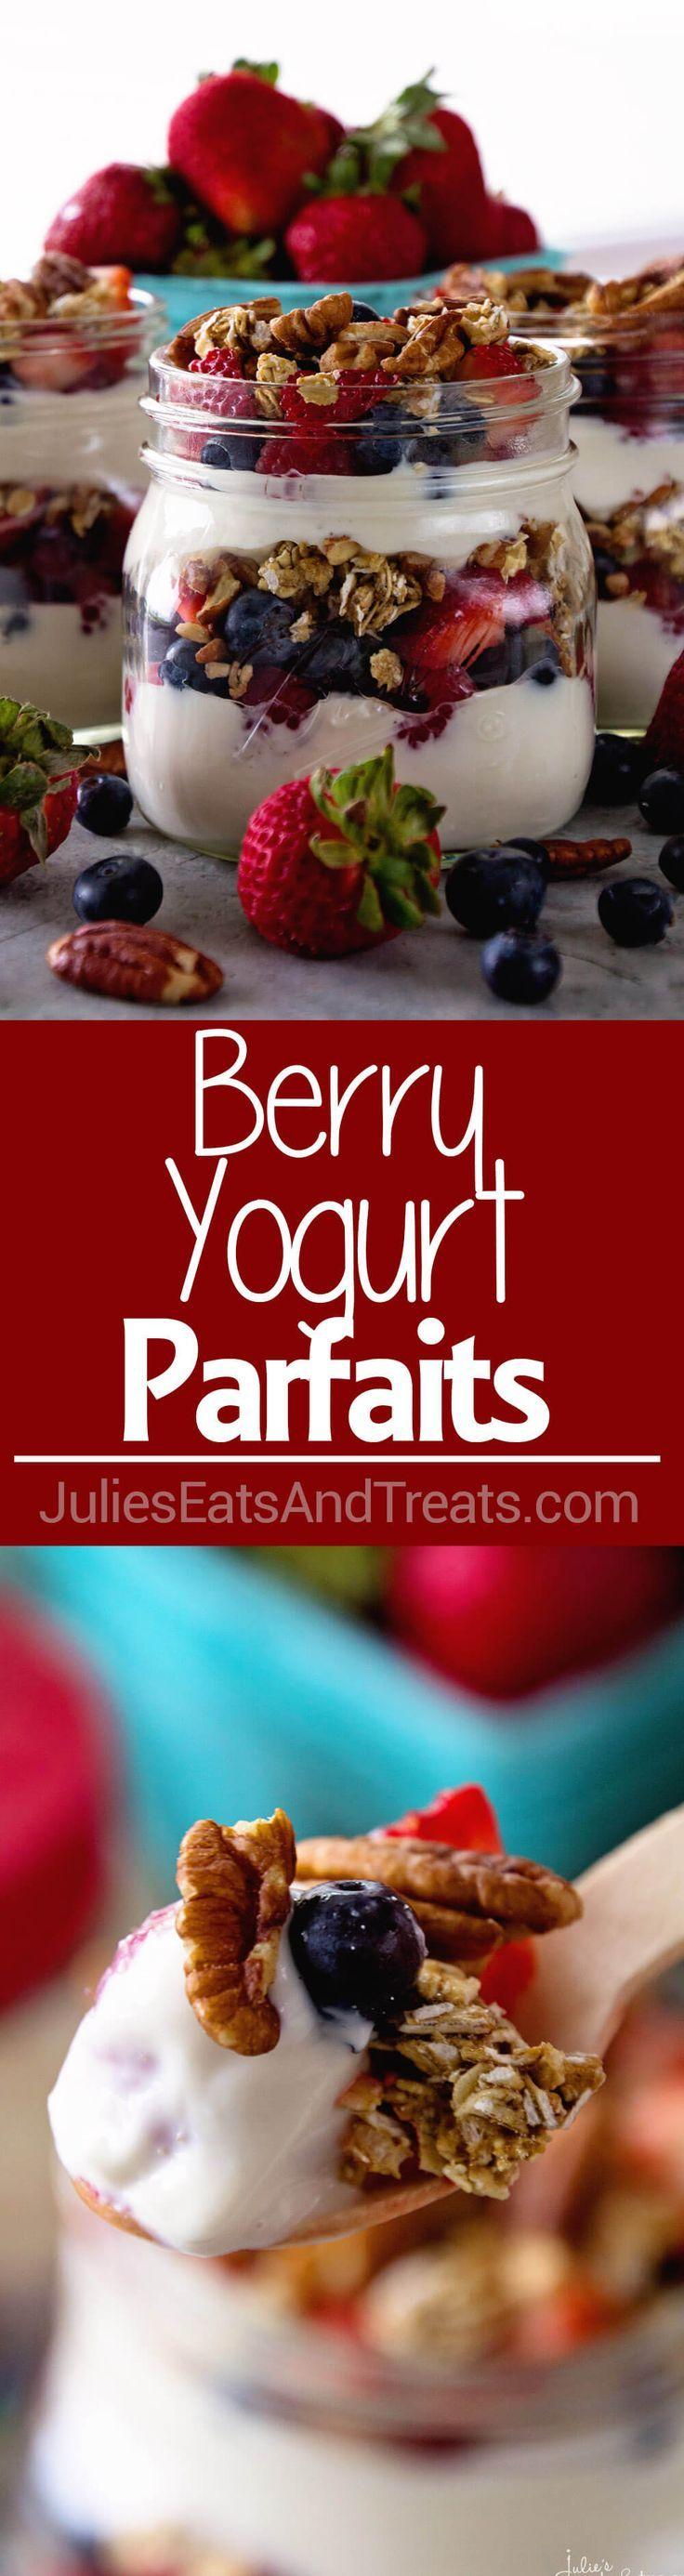 Berry Yogurt Breakfast Parfait